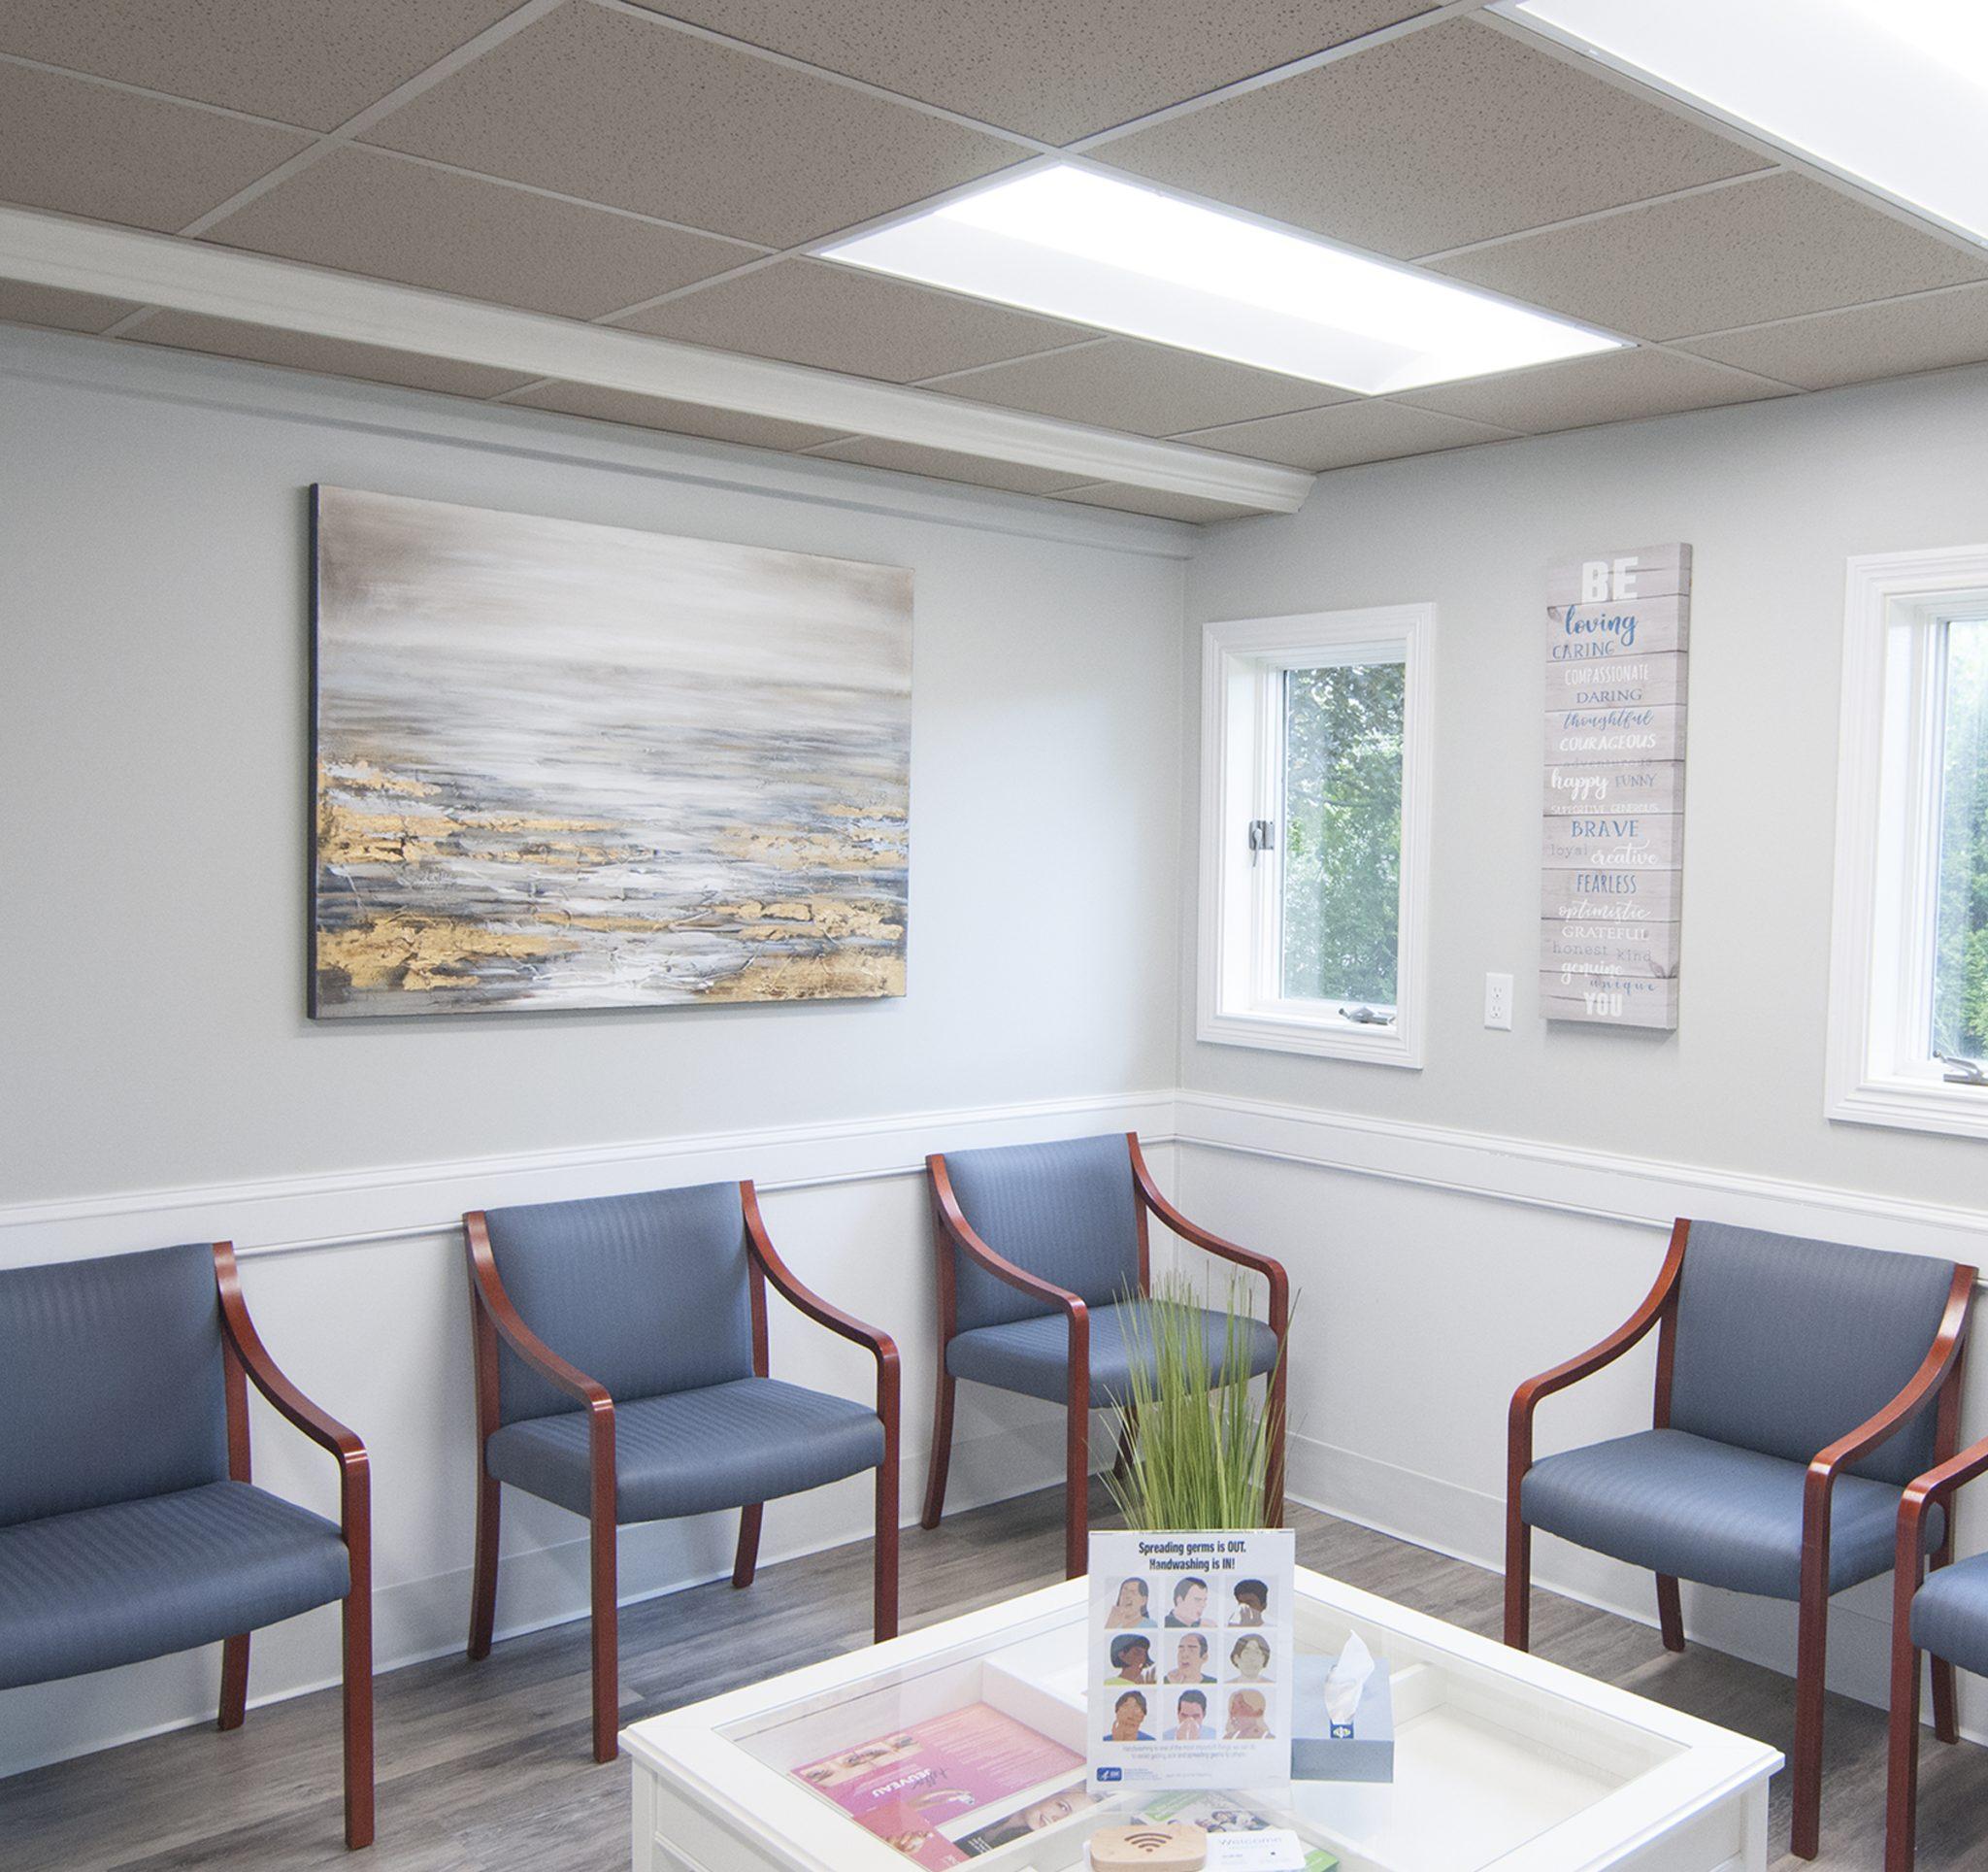 waitingroomimage